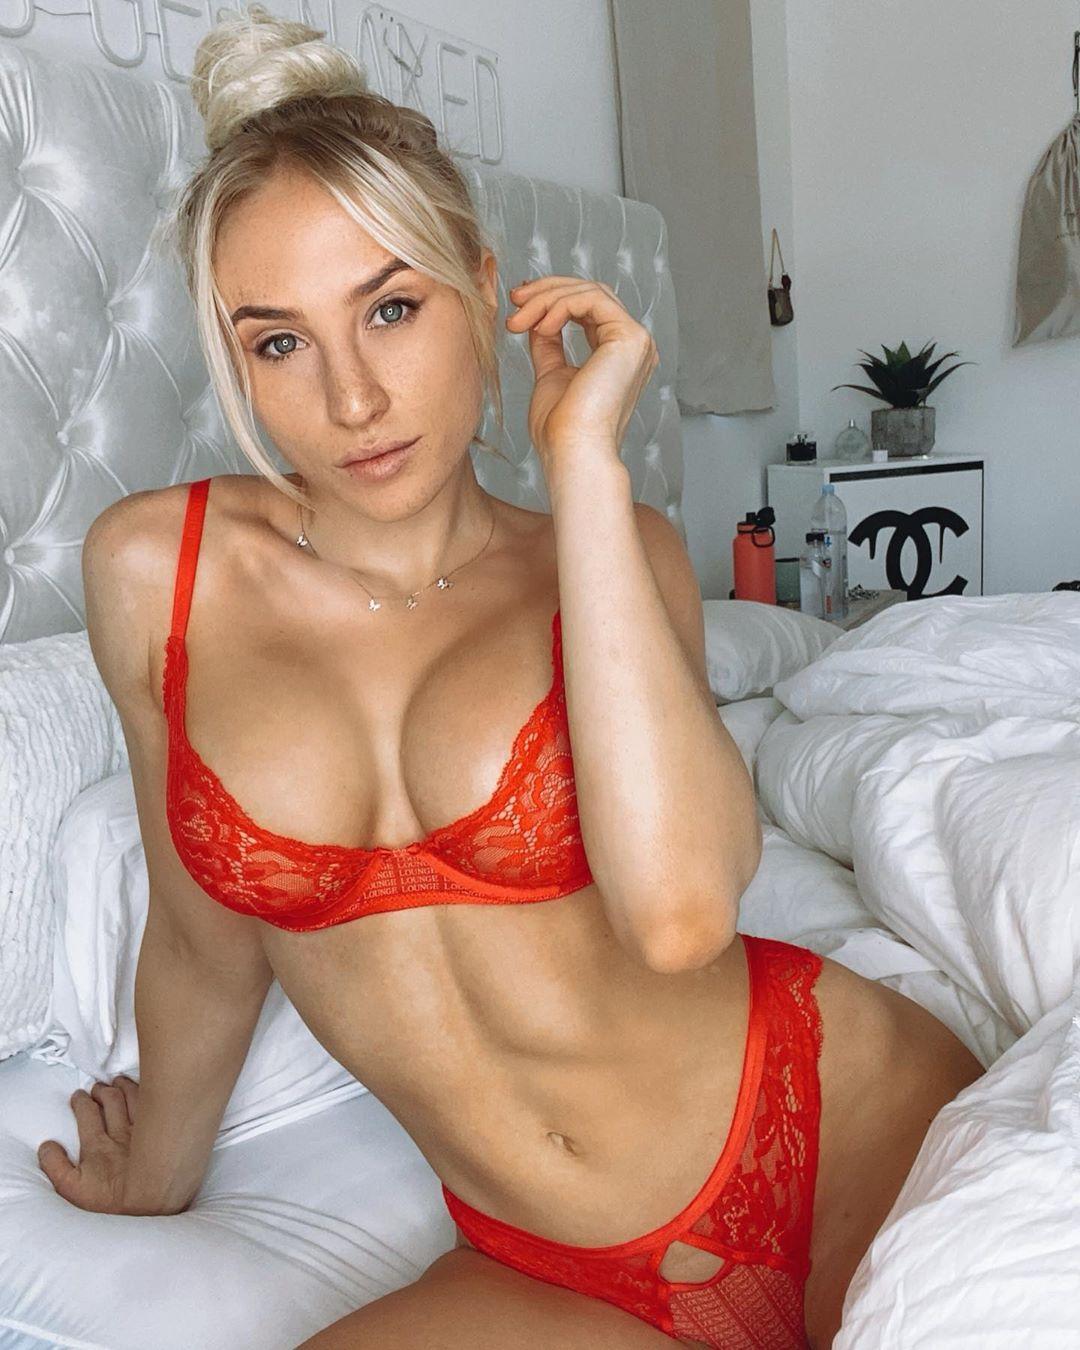 Lauren Dascalo Nude Onlyfans Leaked! 0035